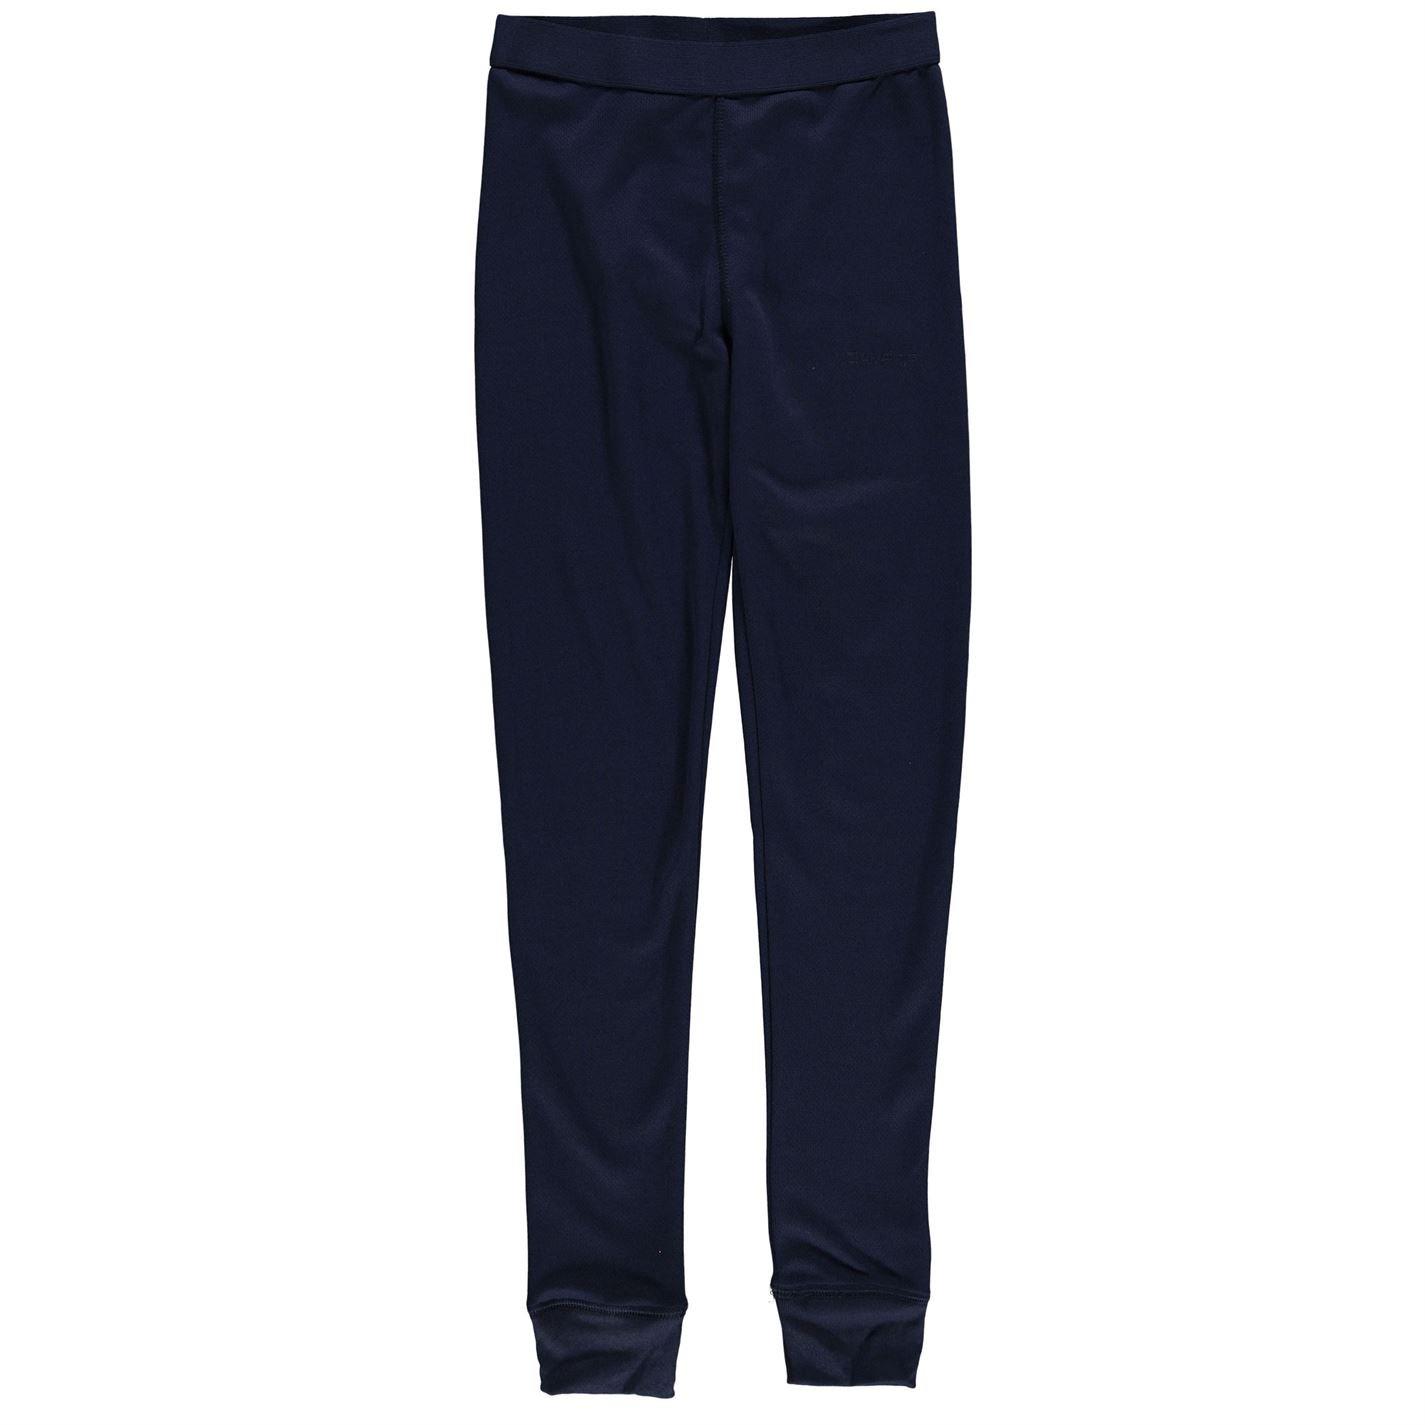 Campri Kids Thermal Baselayer Pants Unisex Junior Lightweight Elastic Bottoms